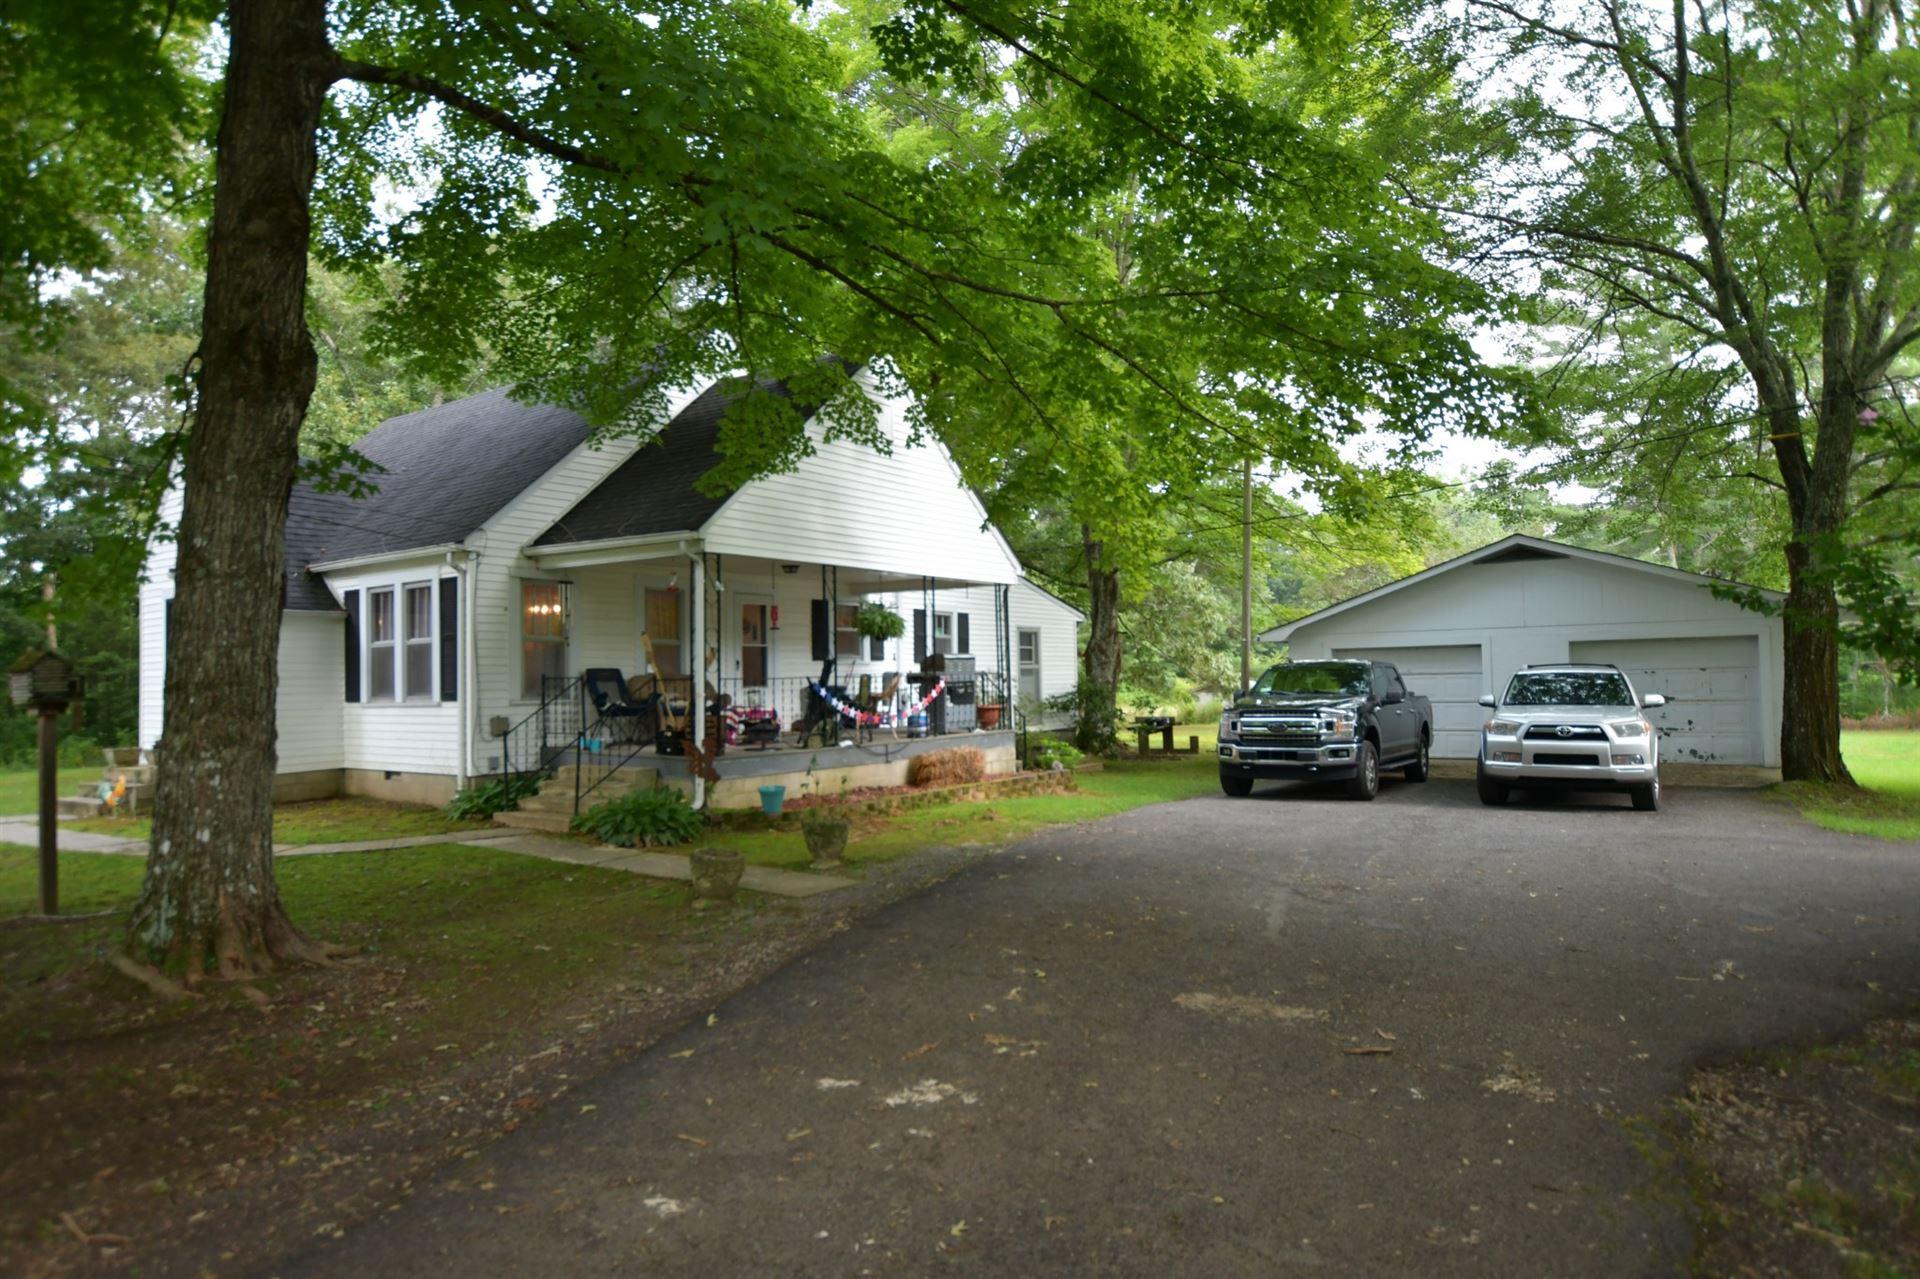 13242 US 41, Monteagle, TN 37356 - MLS#: 2278224